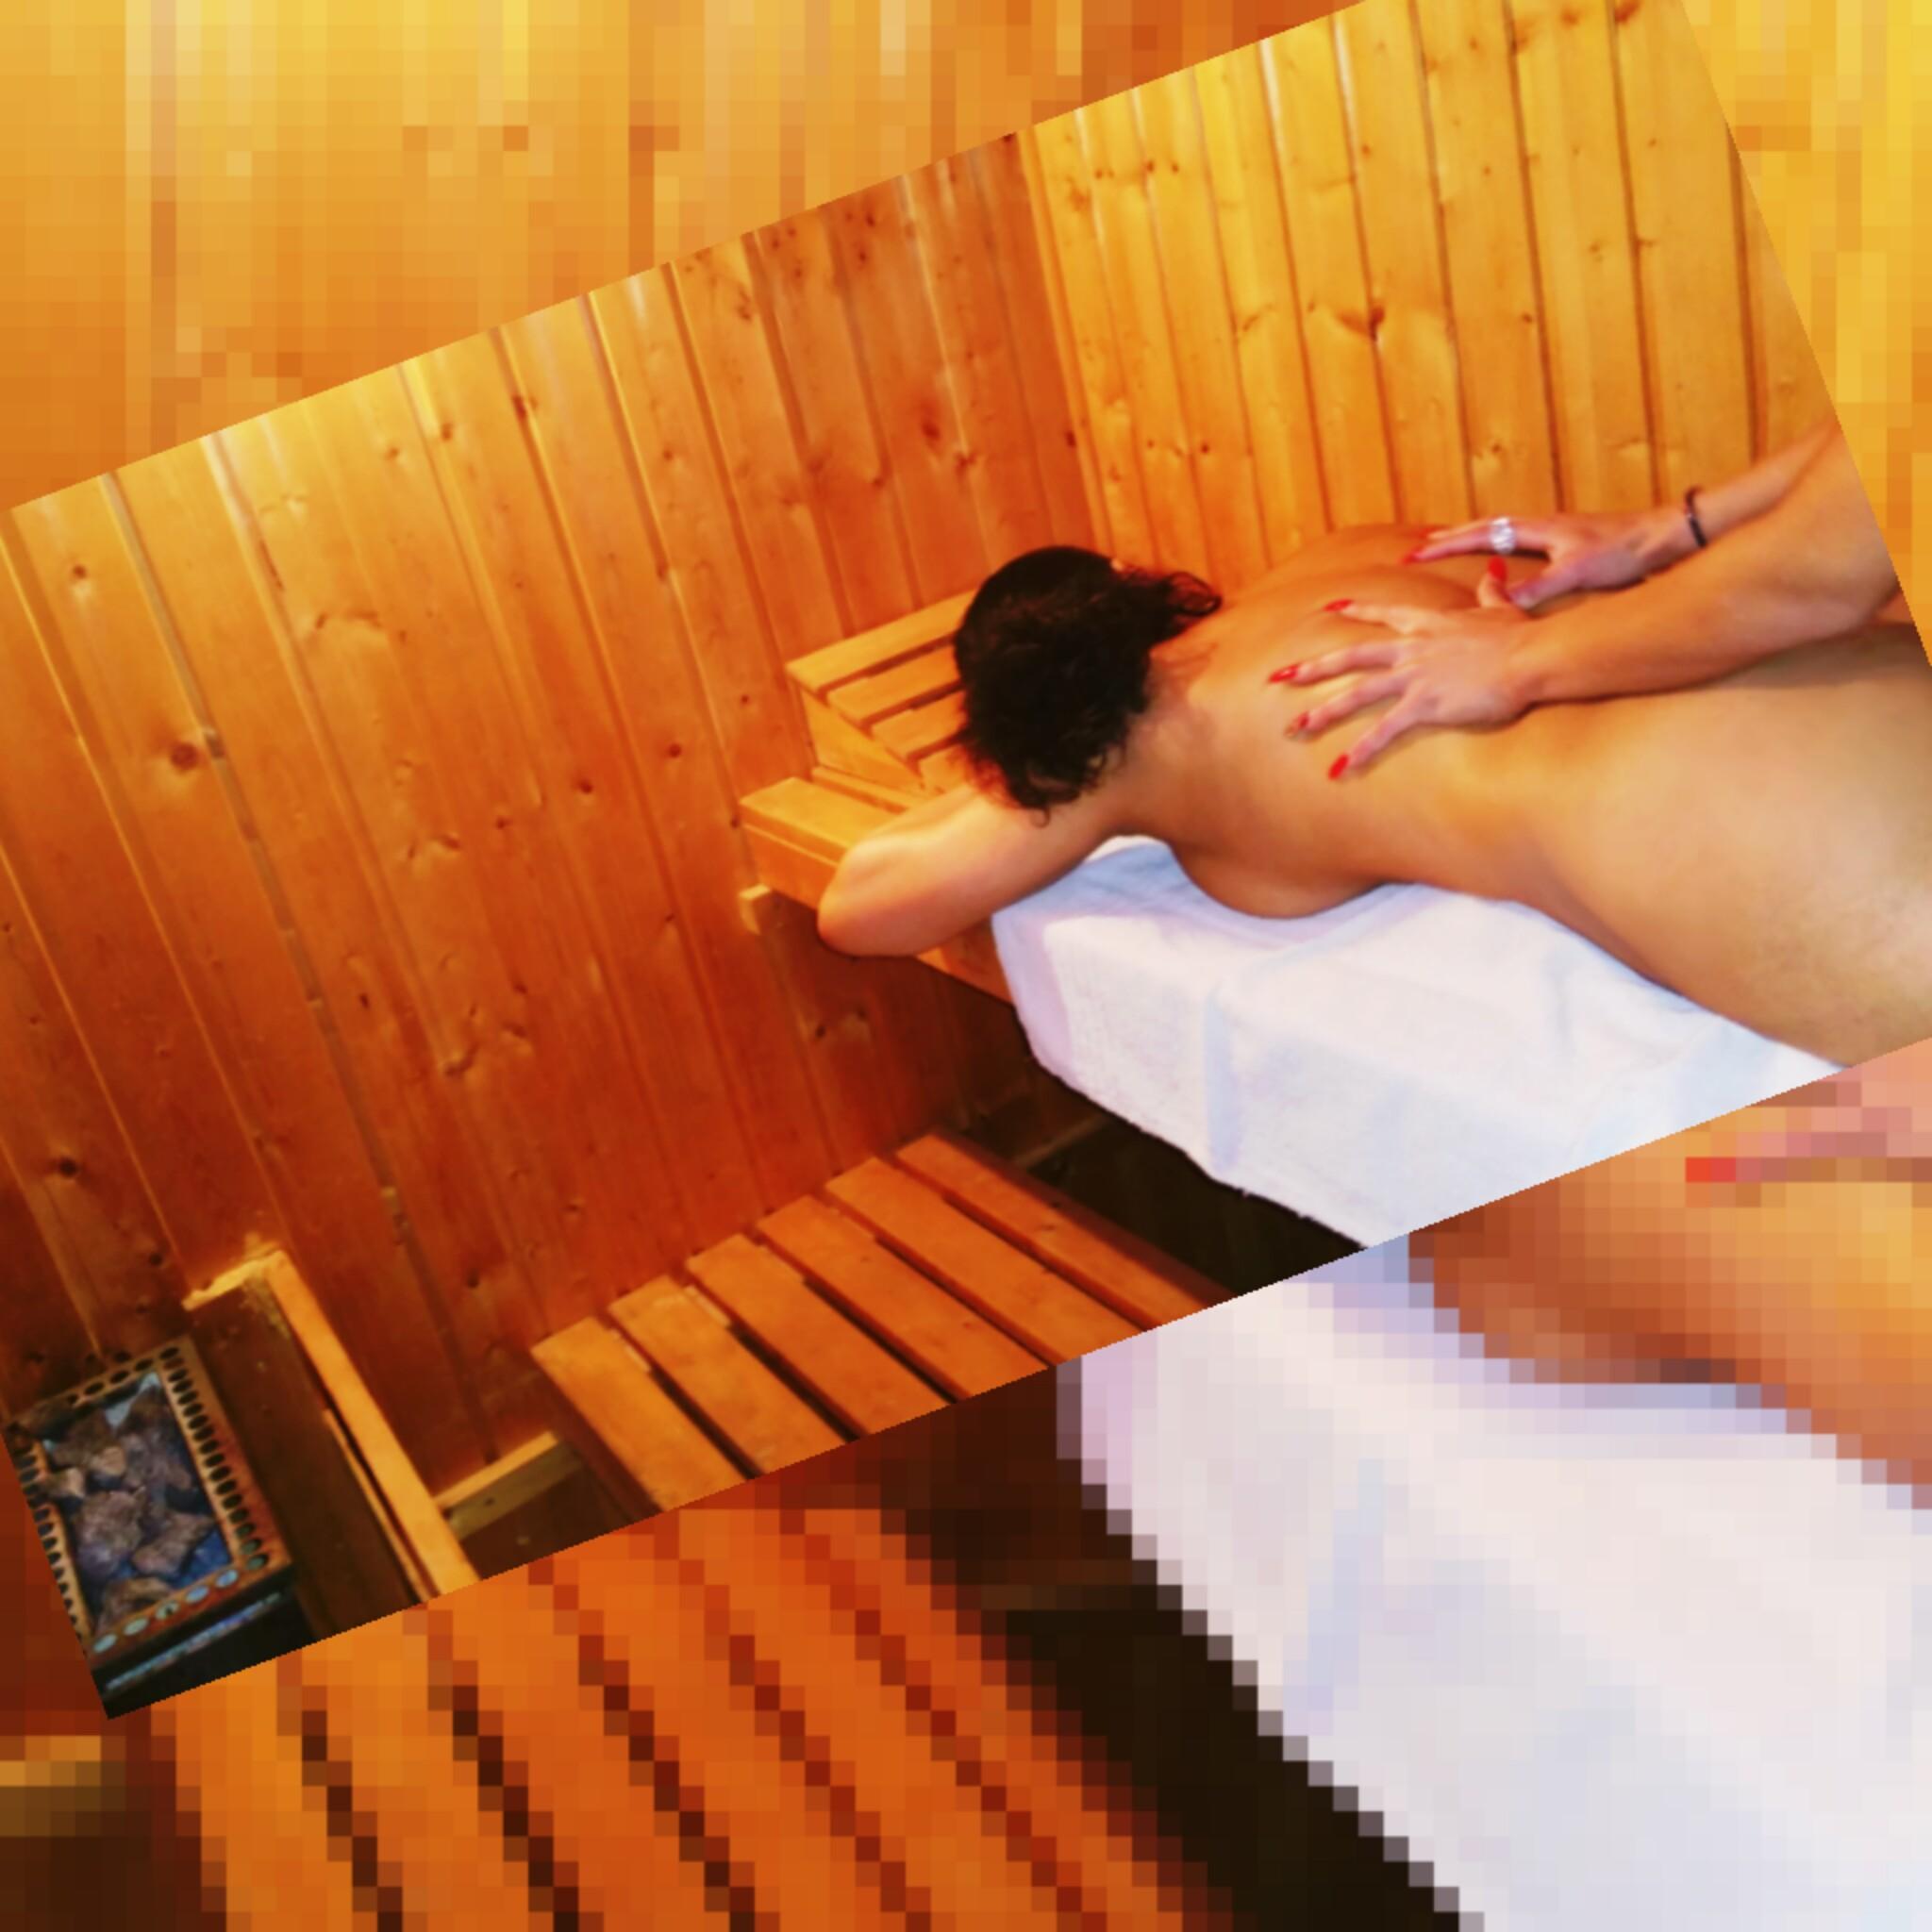 erotische thaise massage den haag kut kijken